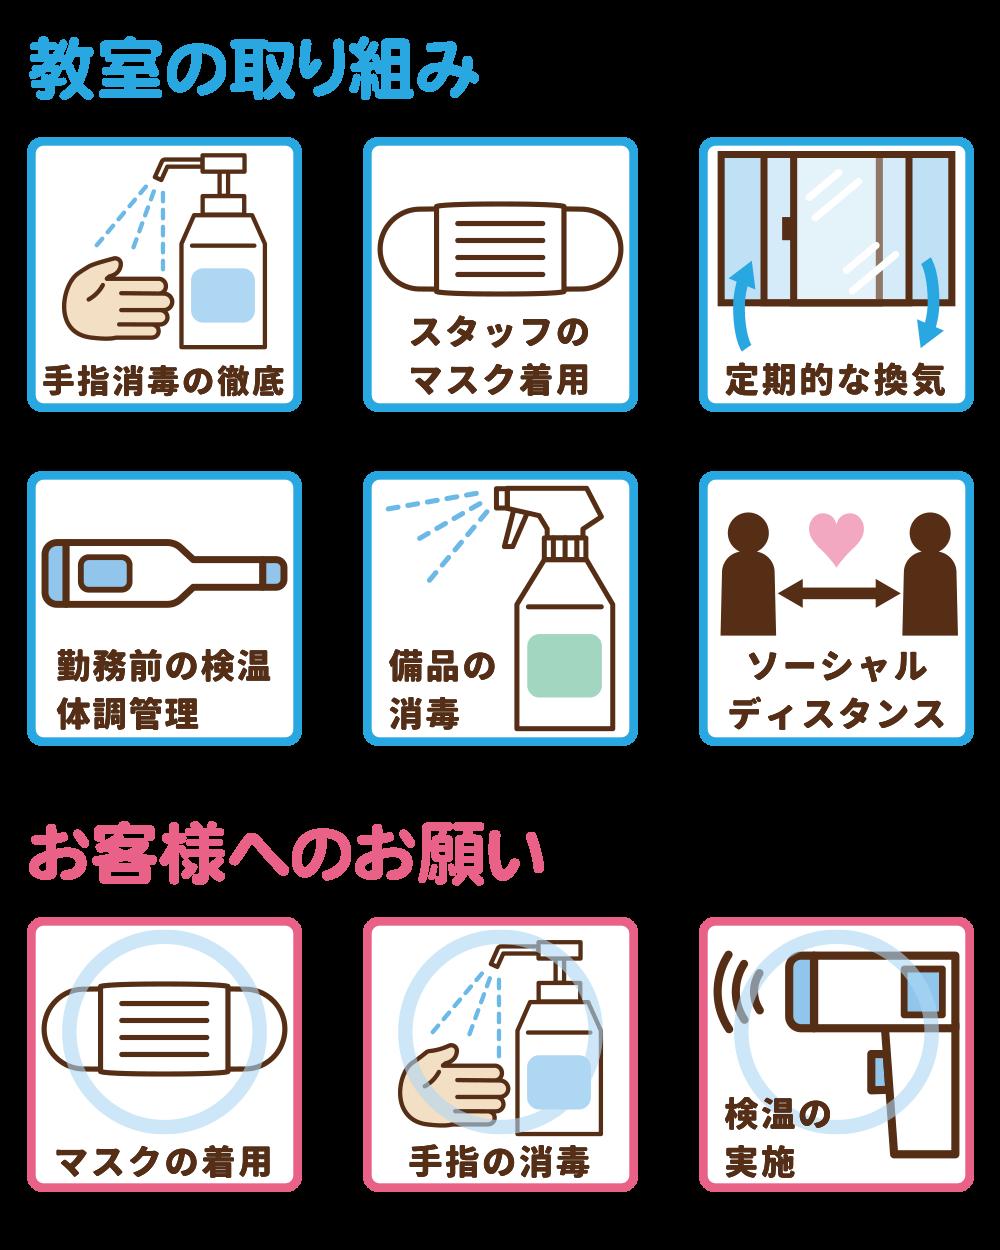 kansen-taisaku-shousai